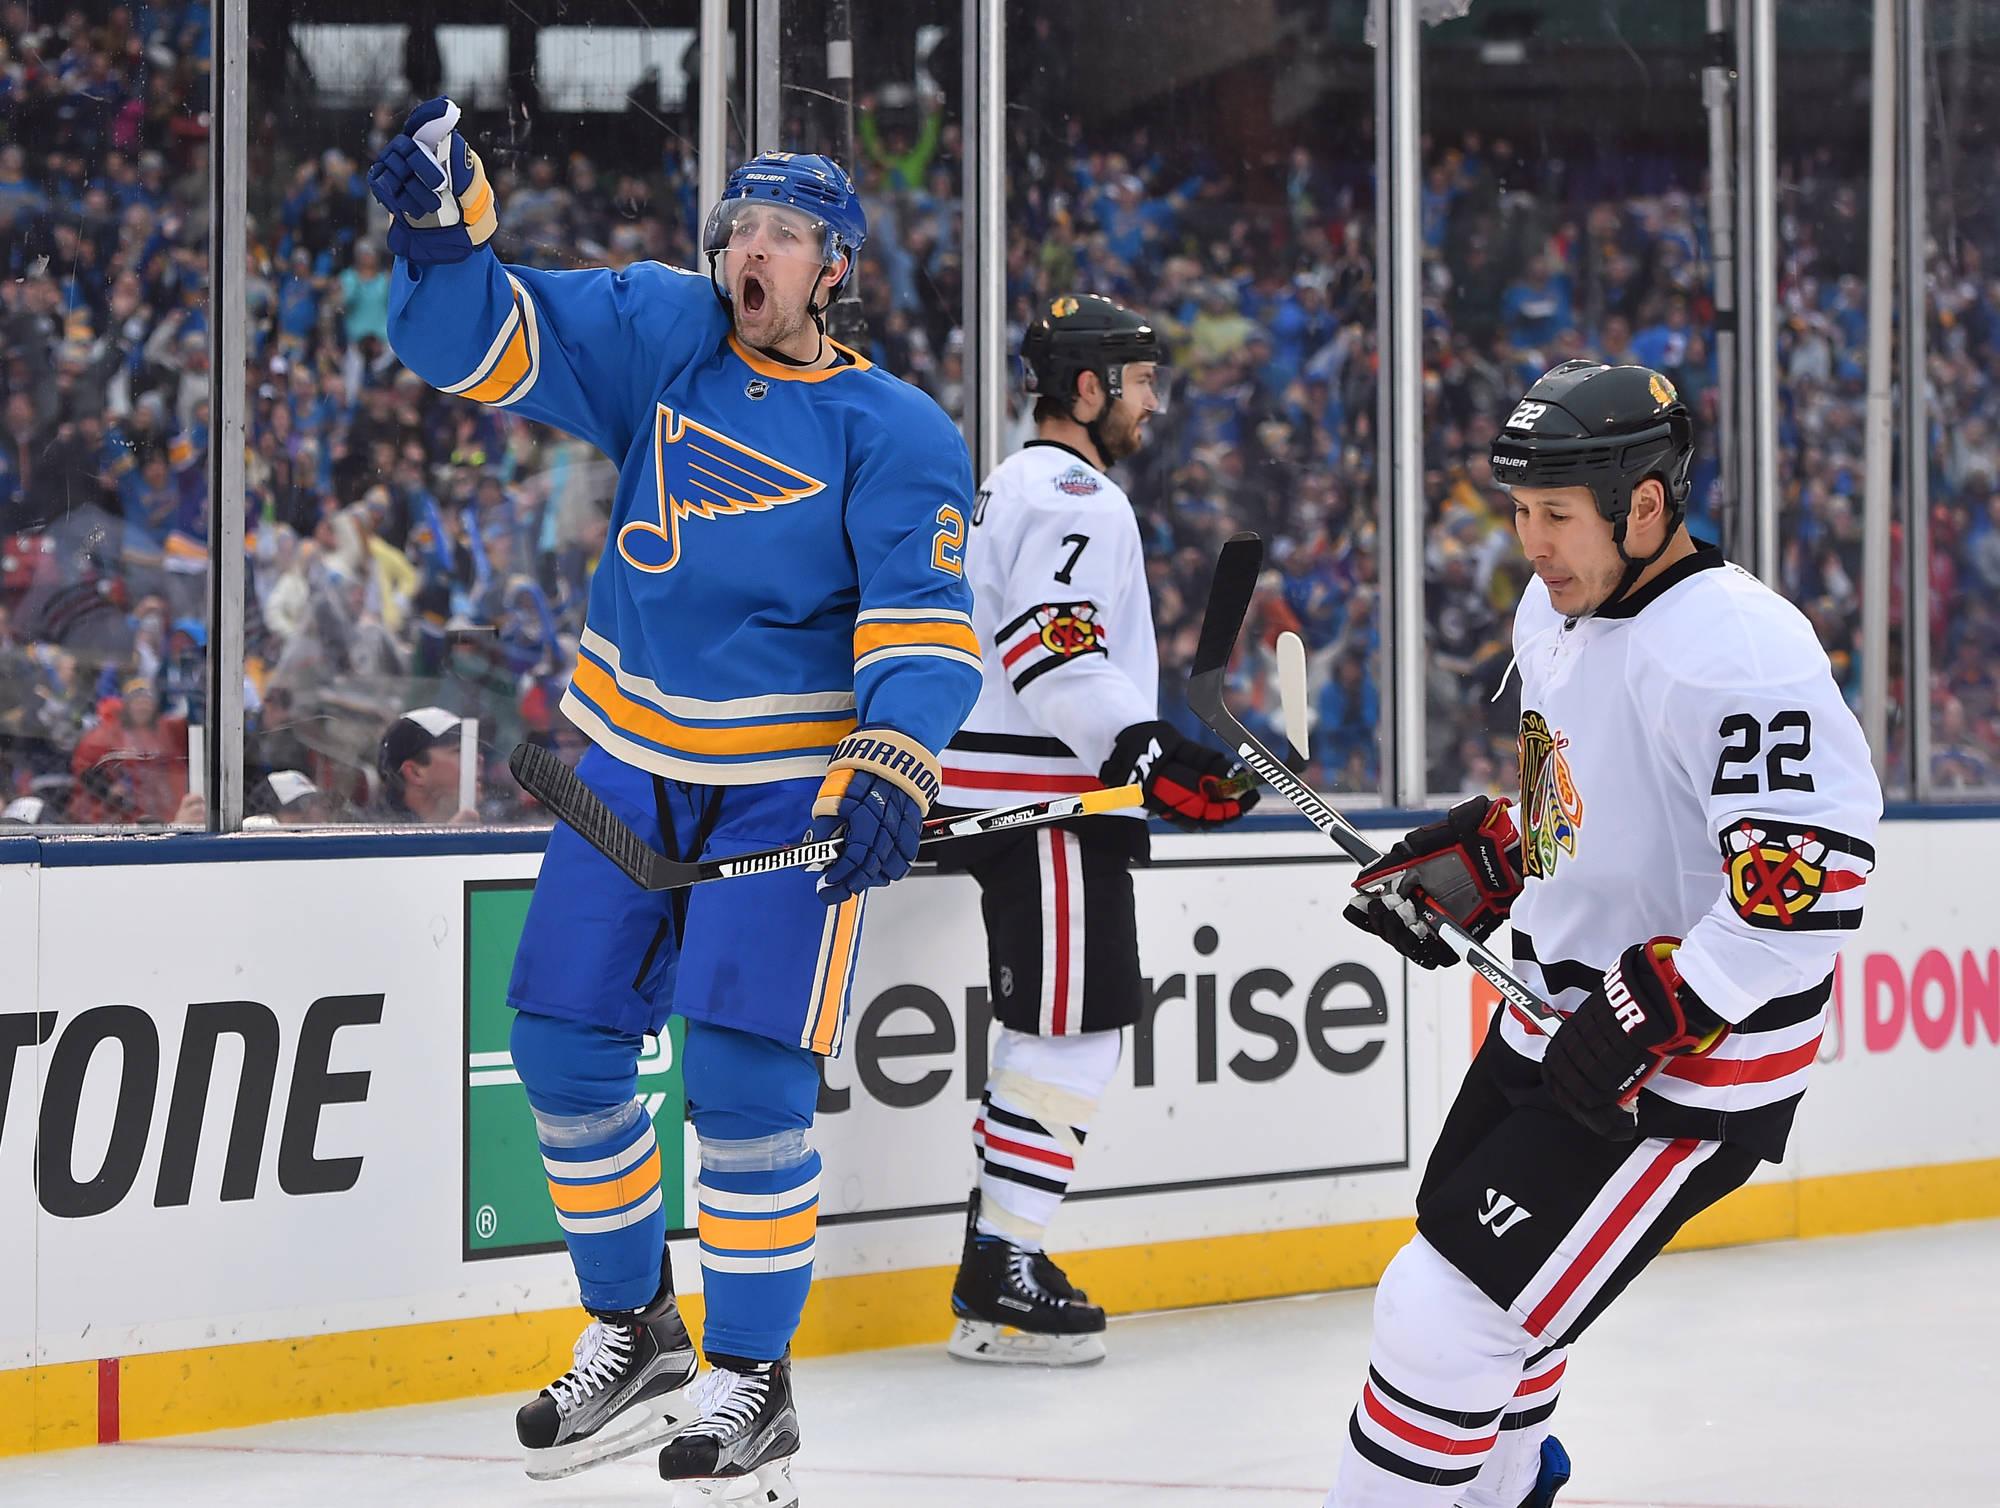 Tarasenko Lifts Blues over Blackhawks